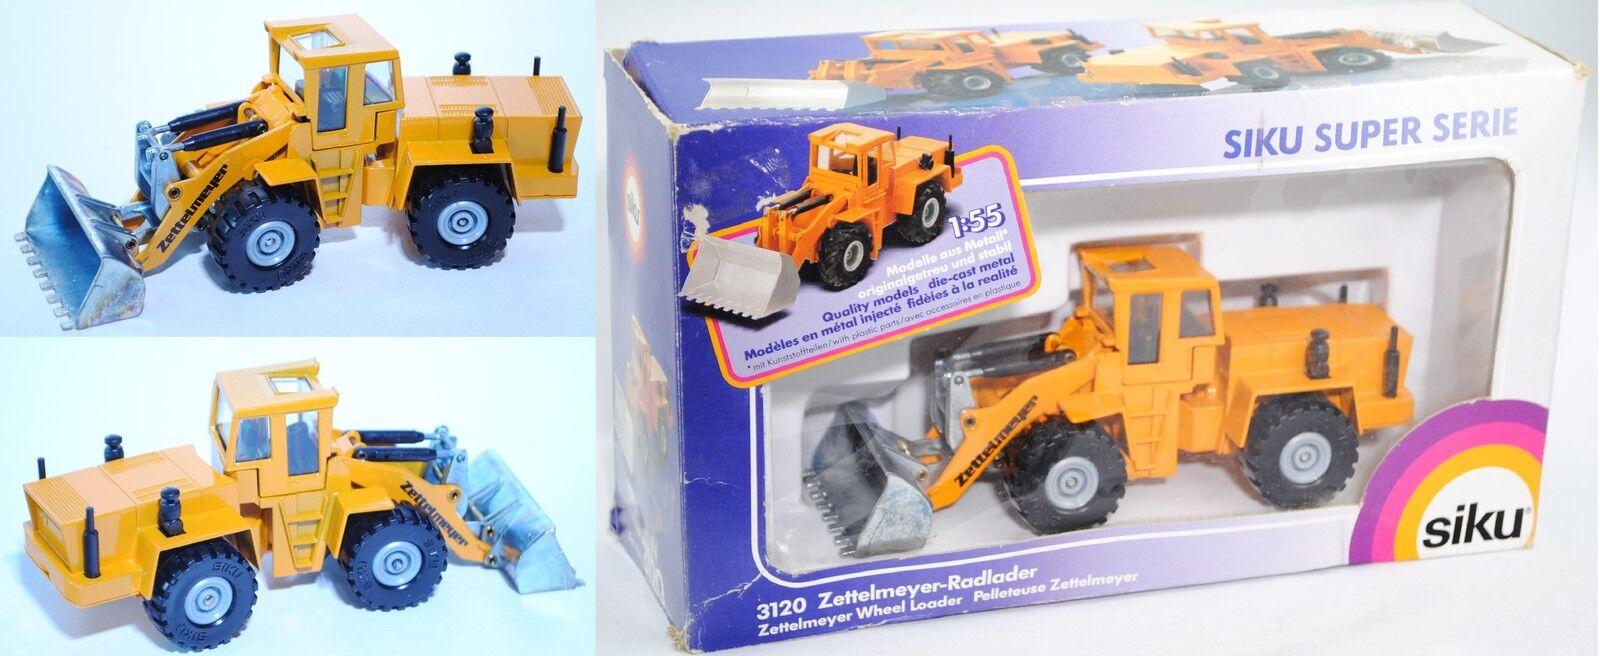 Siku Super 3120 Zettelmeyer-Radlader ZL 4002, ca. 1 55